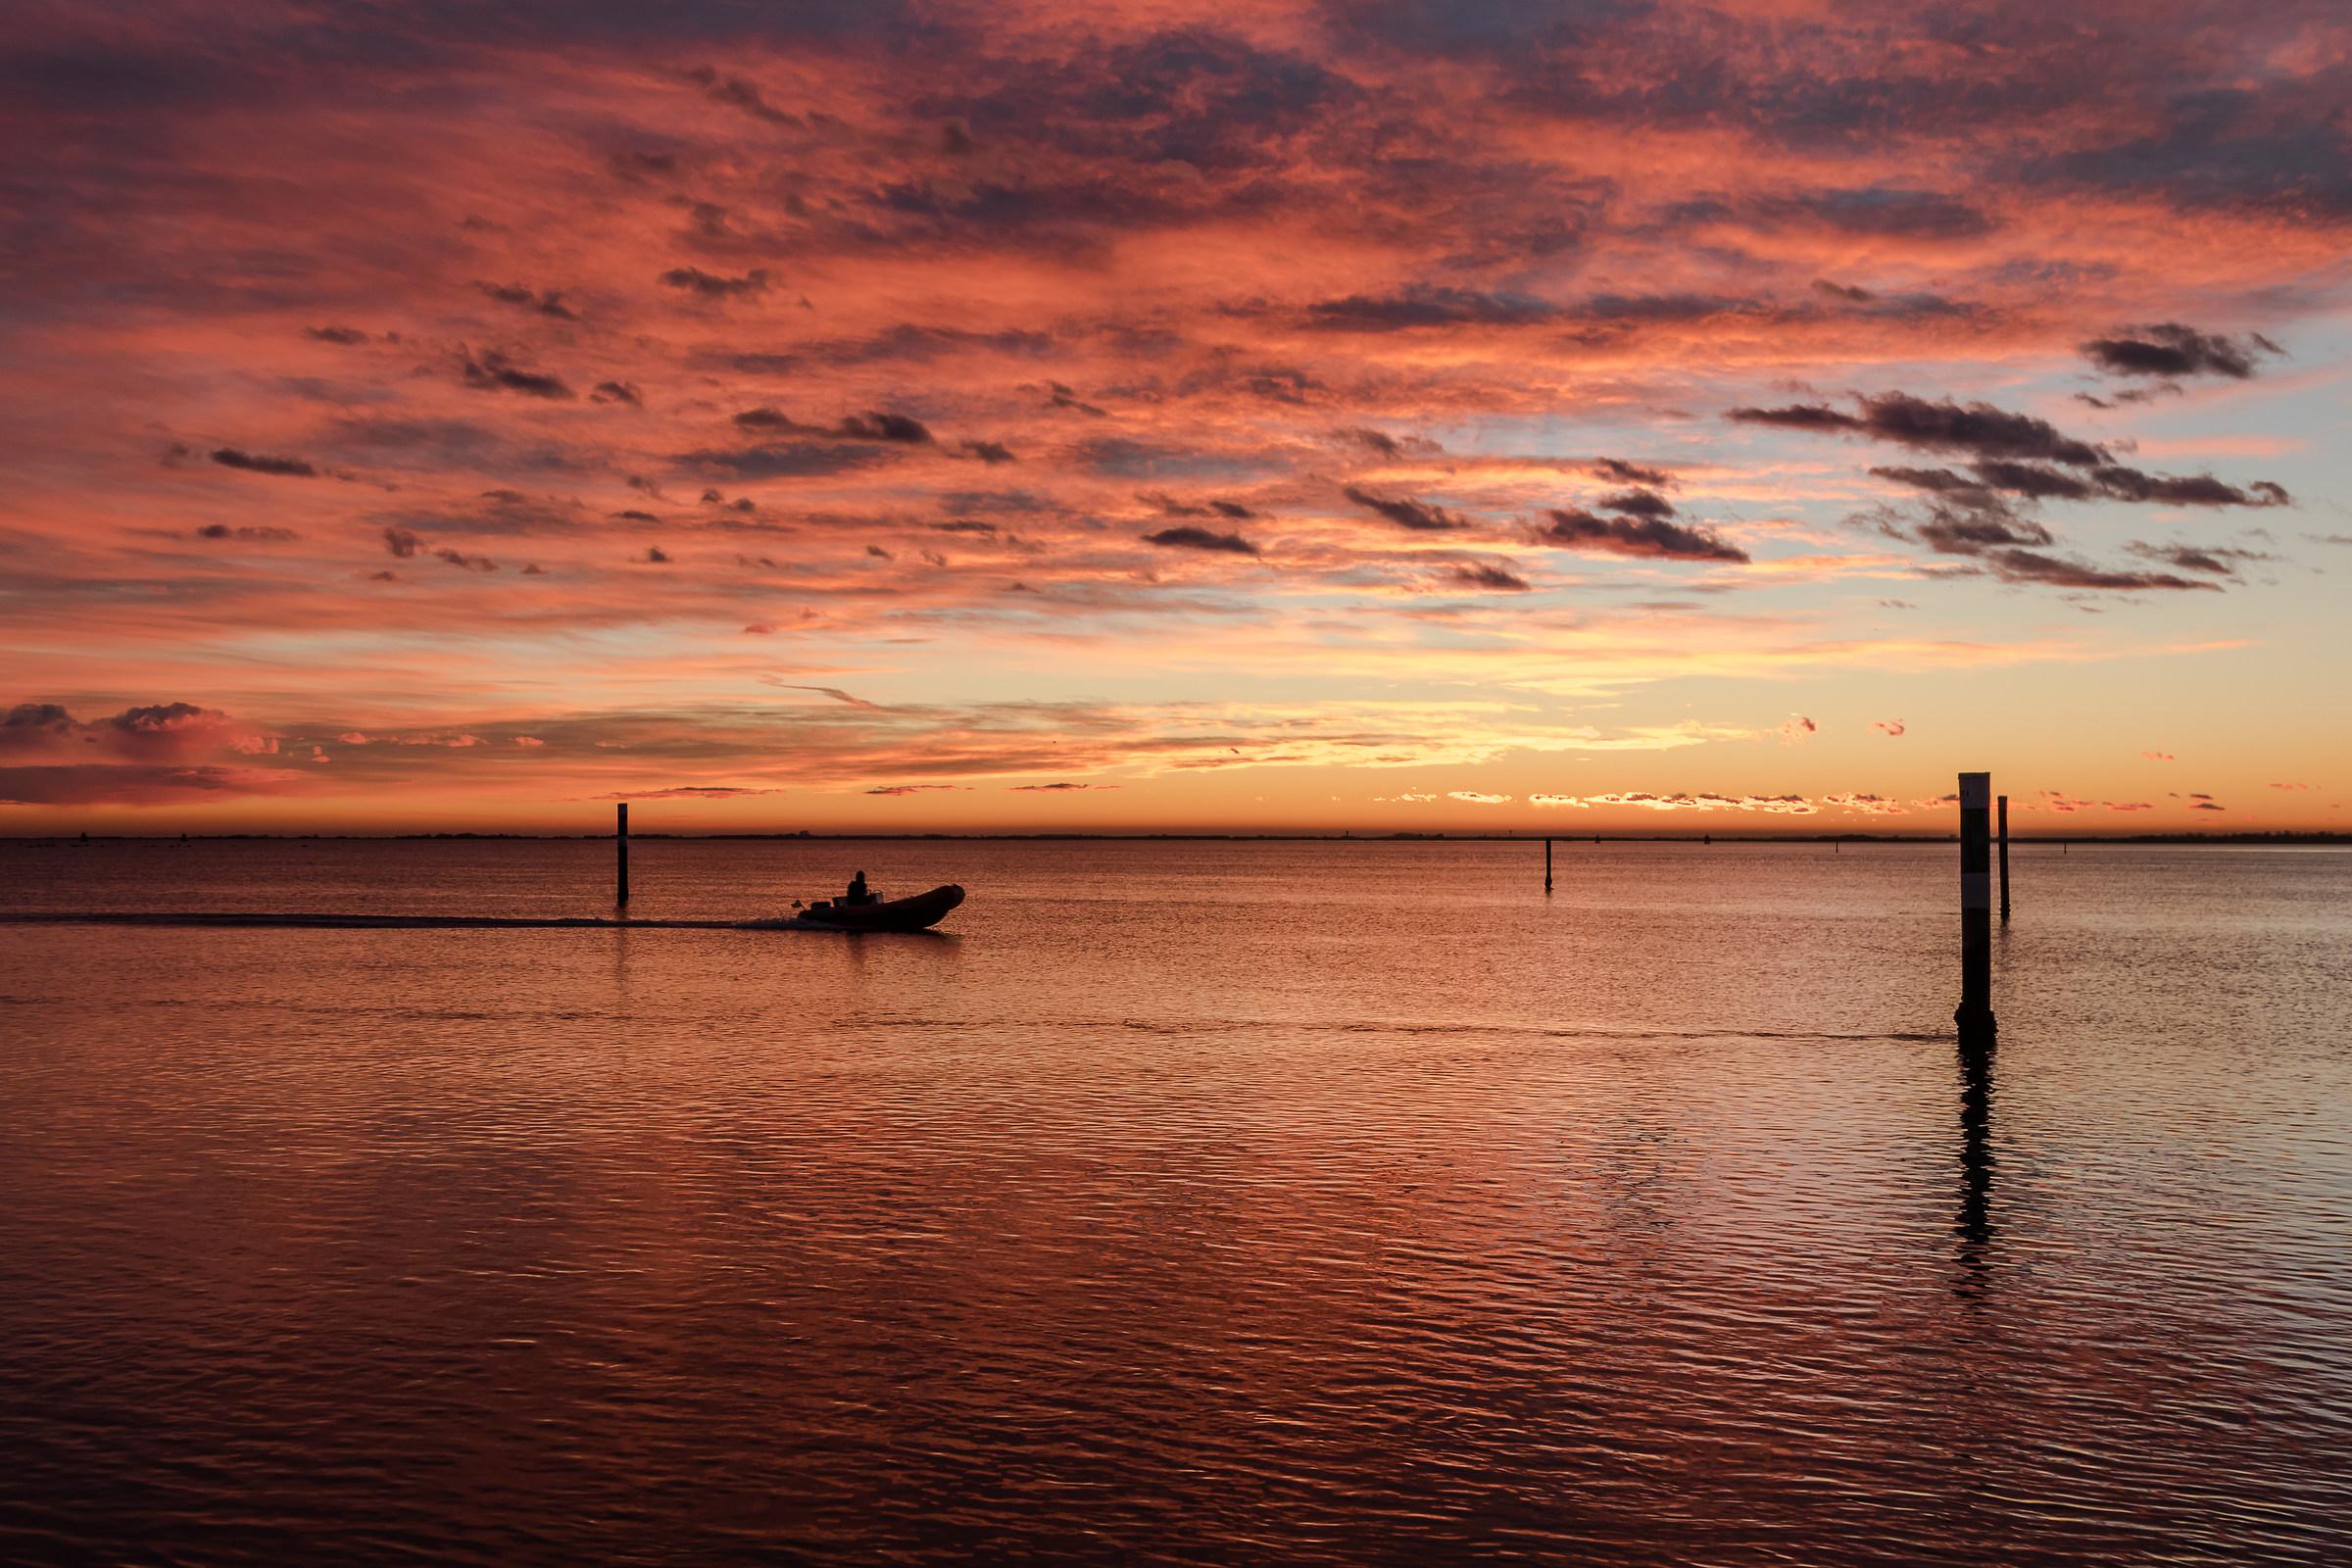 Sunset over the Gulf of Panzano...